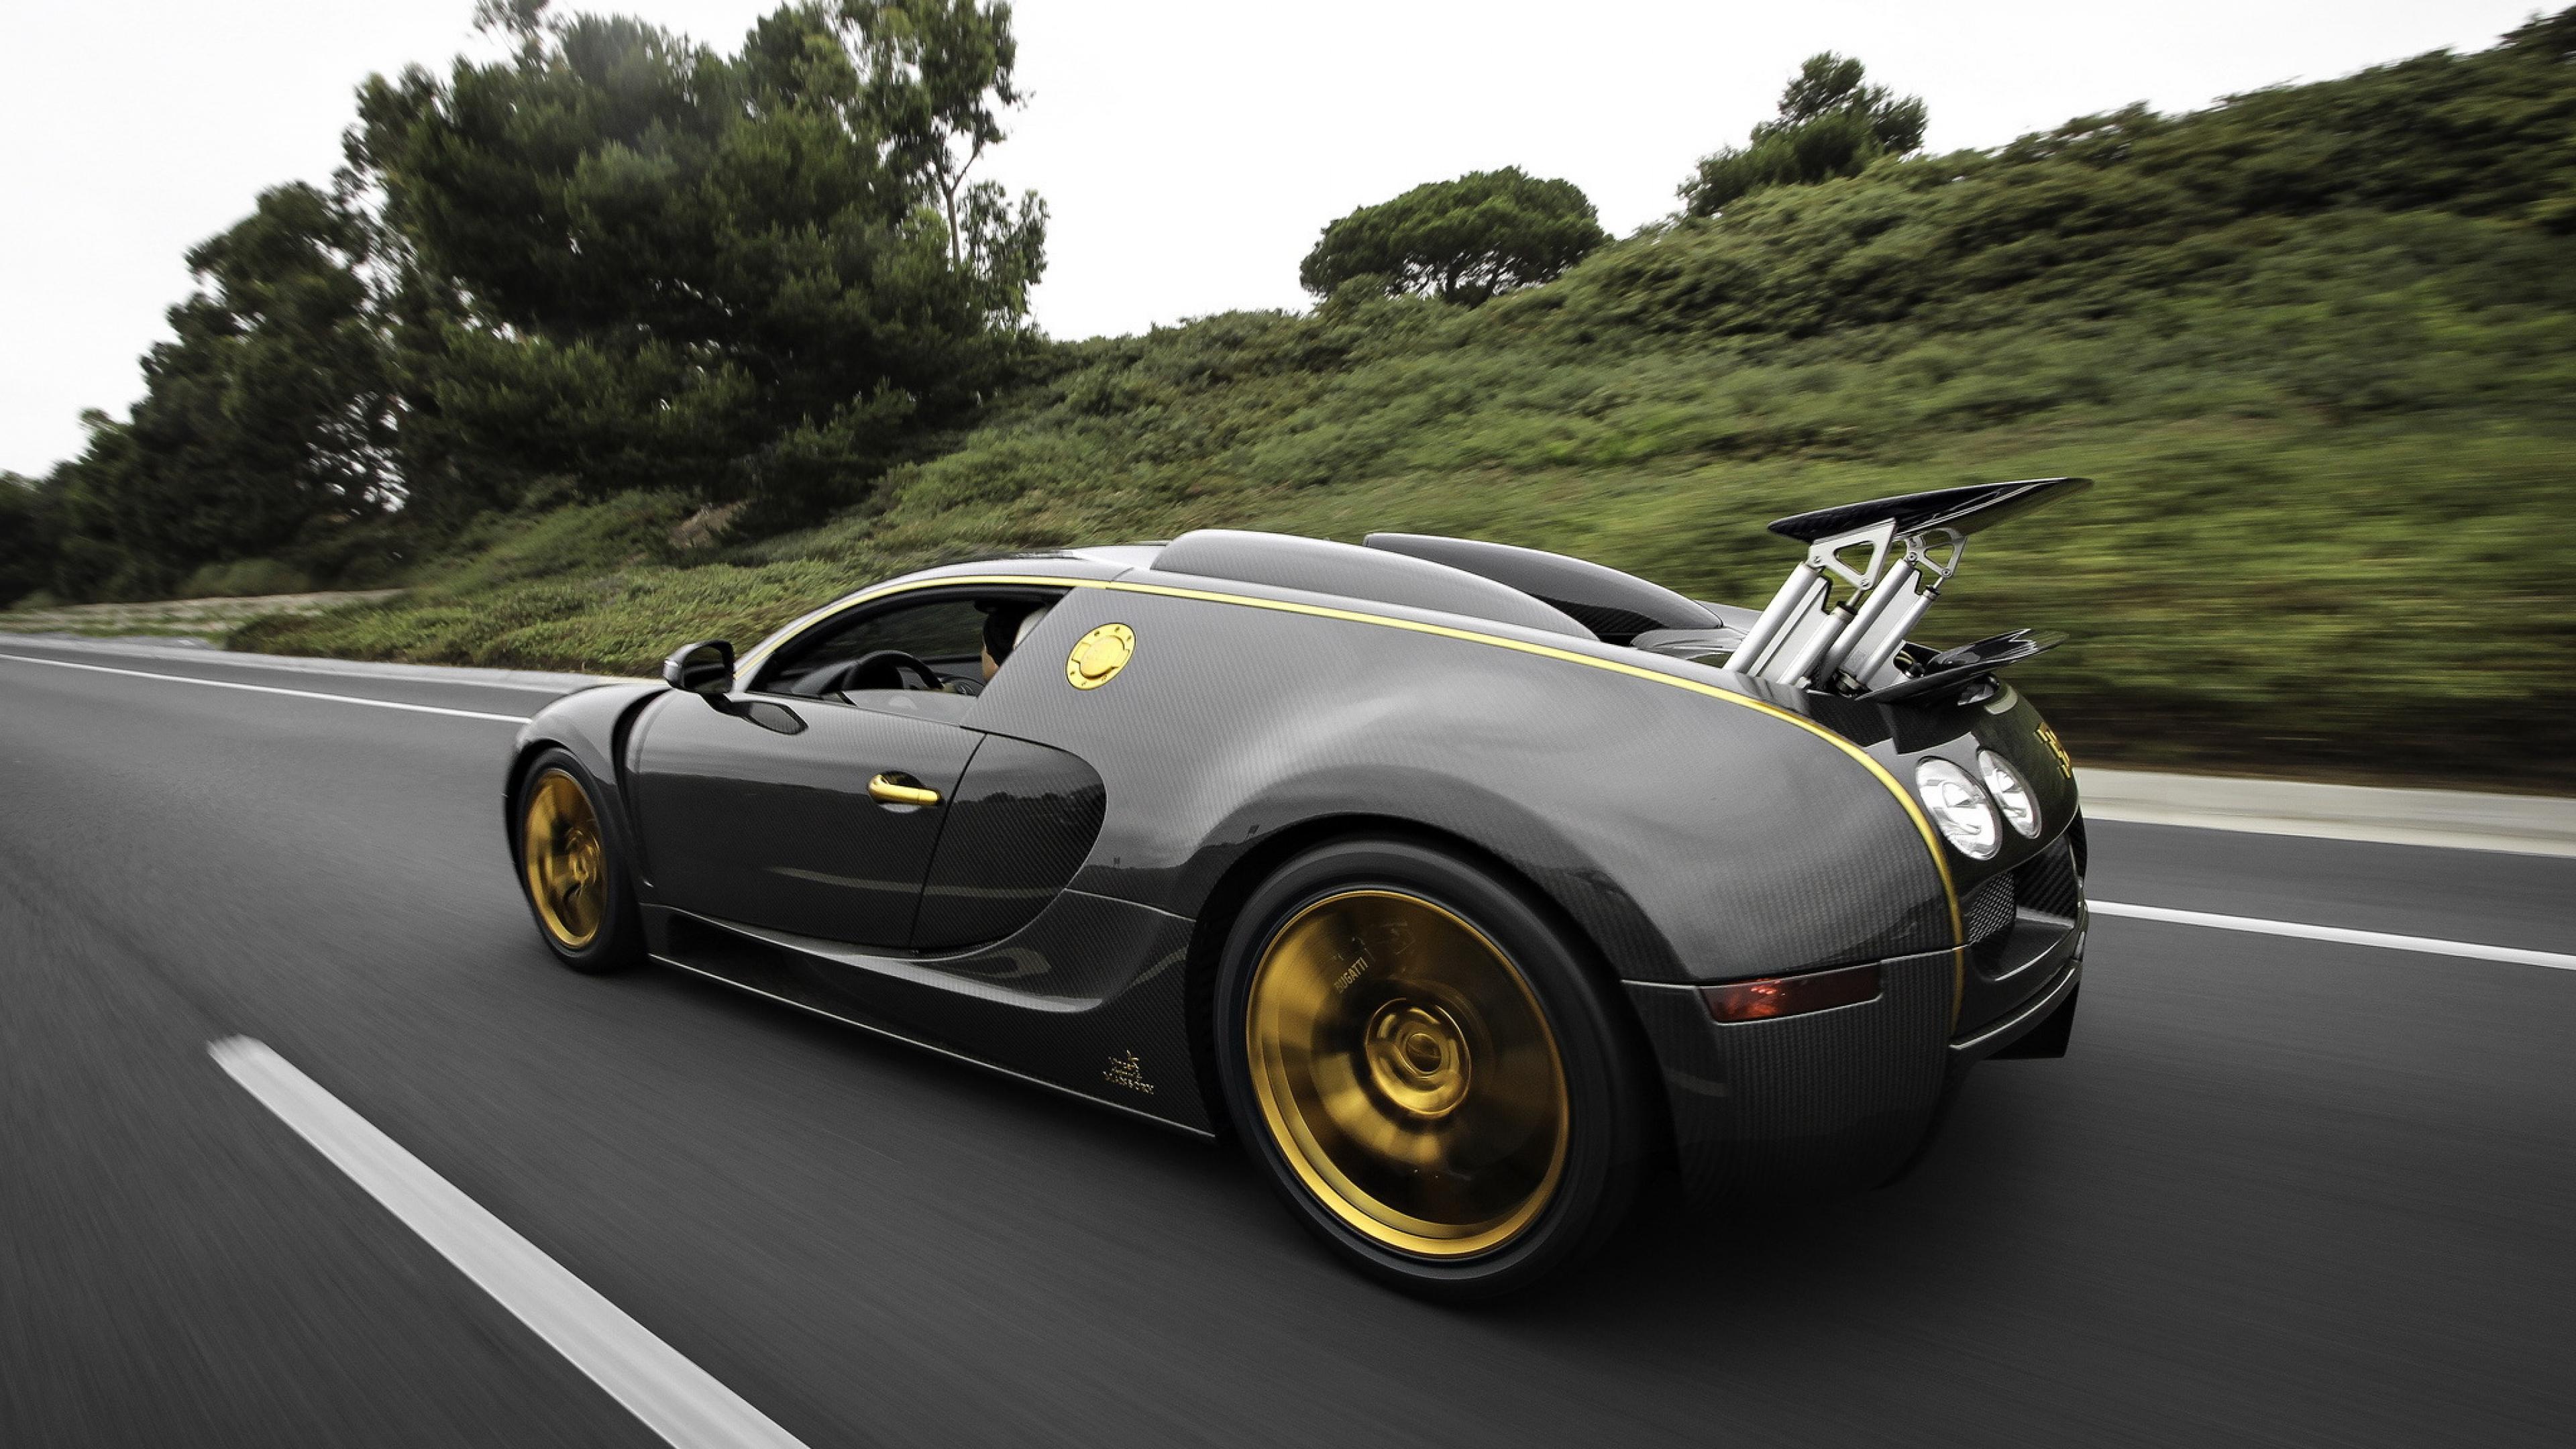 Bugatti Veyron Custom 1280x1024 Resolution